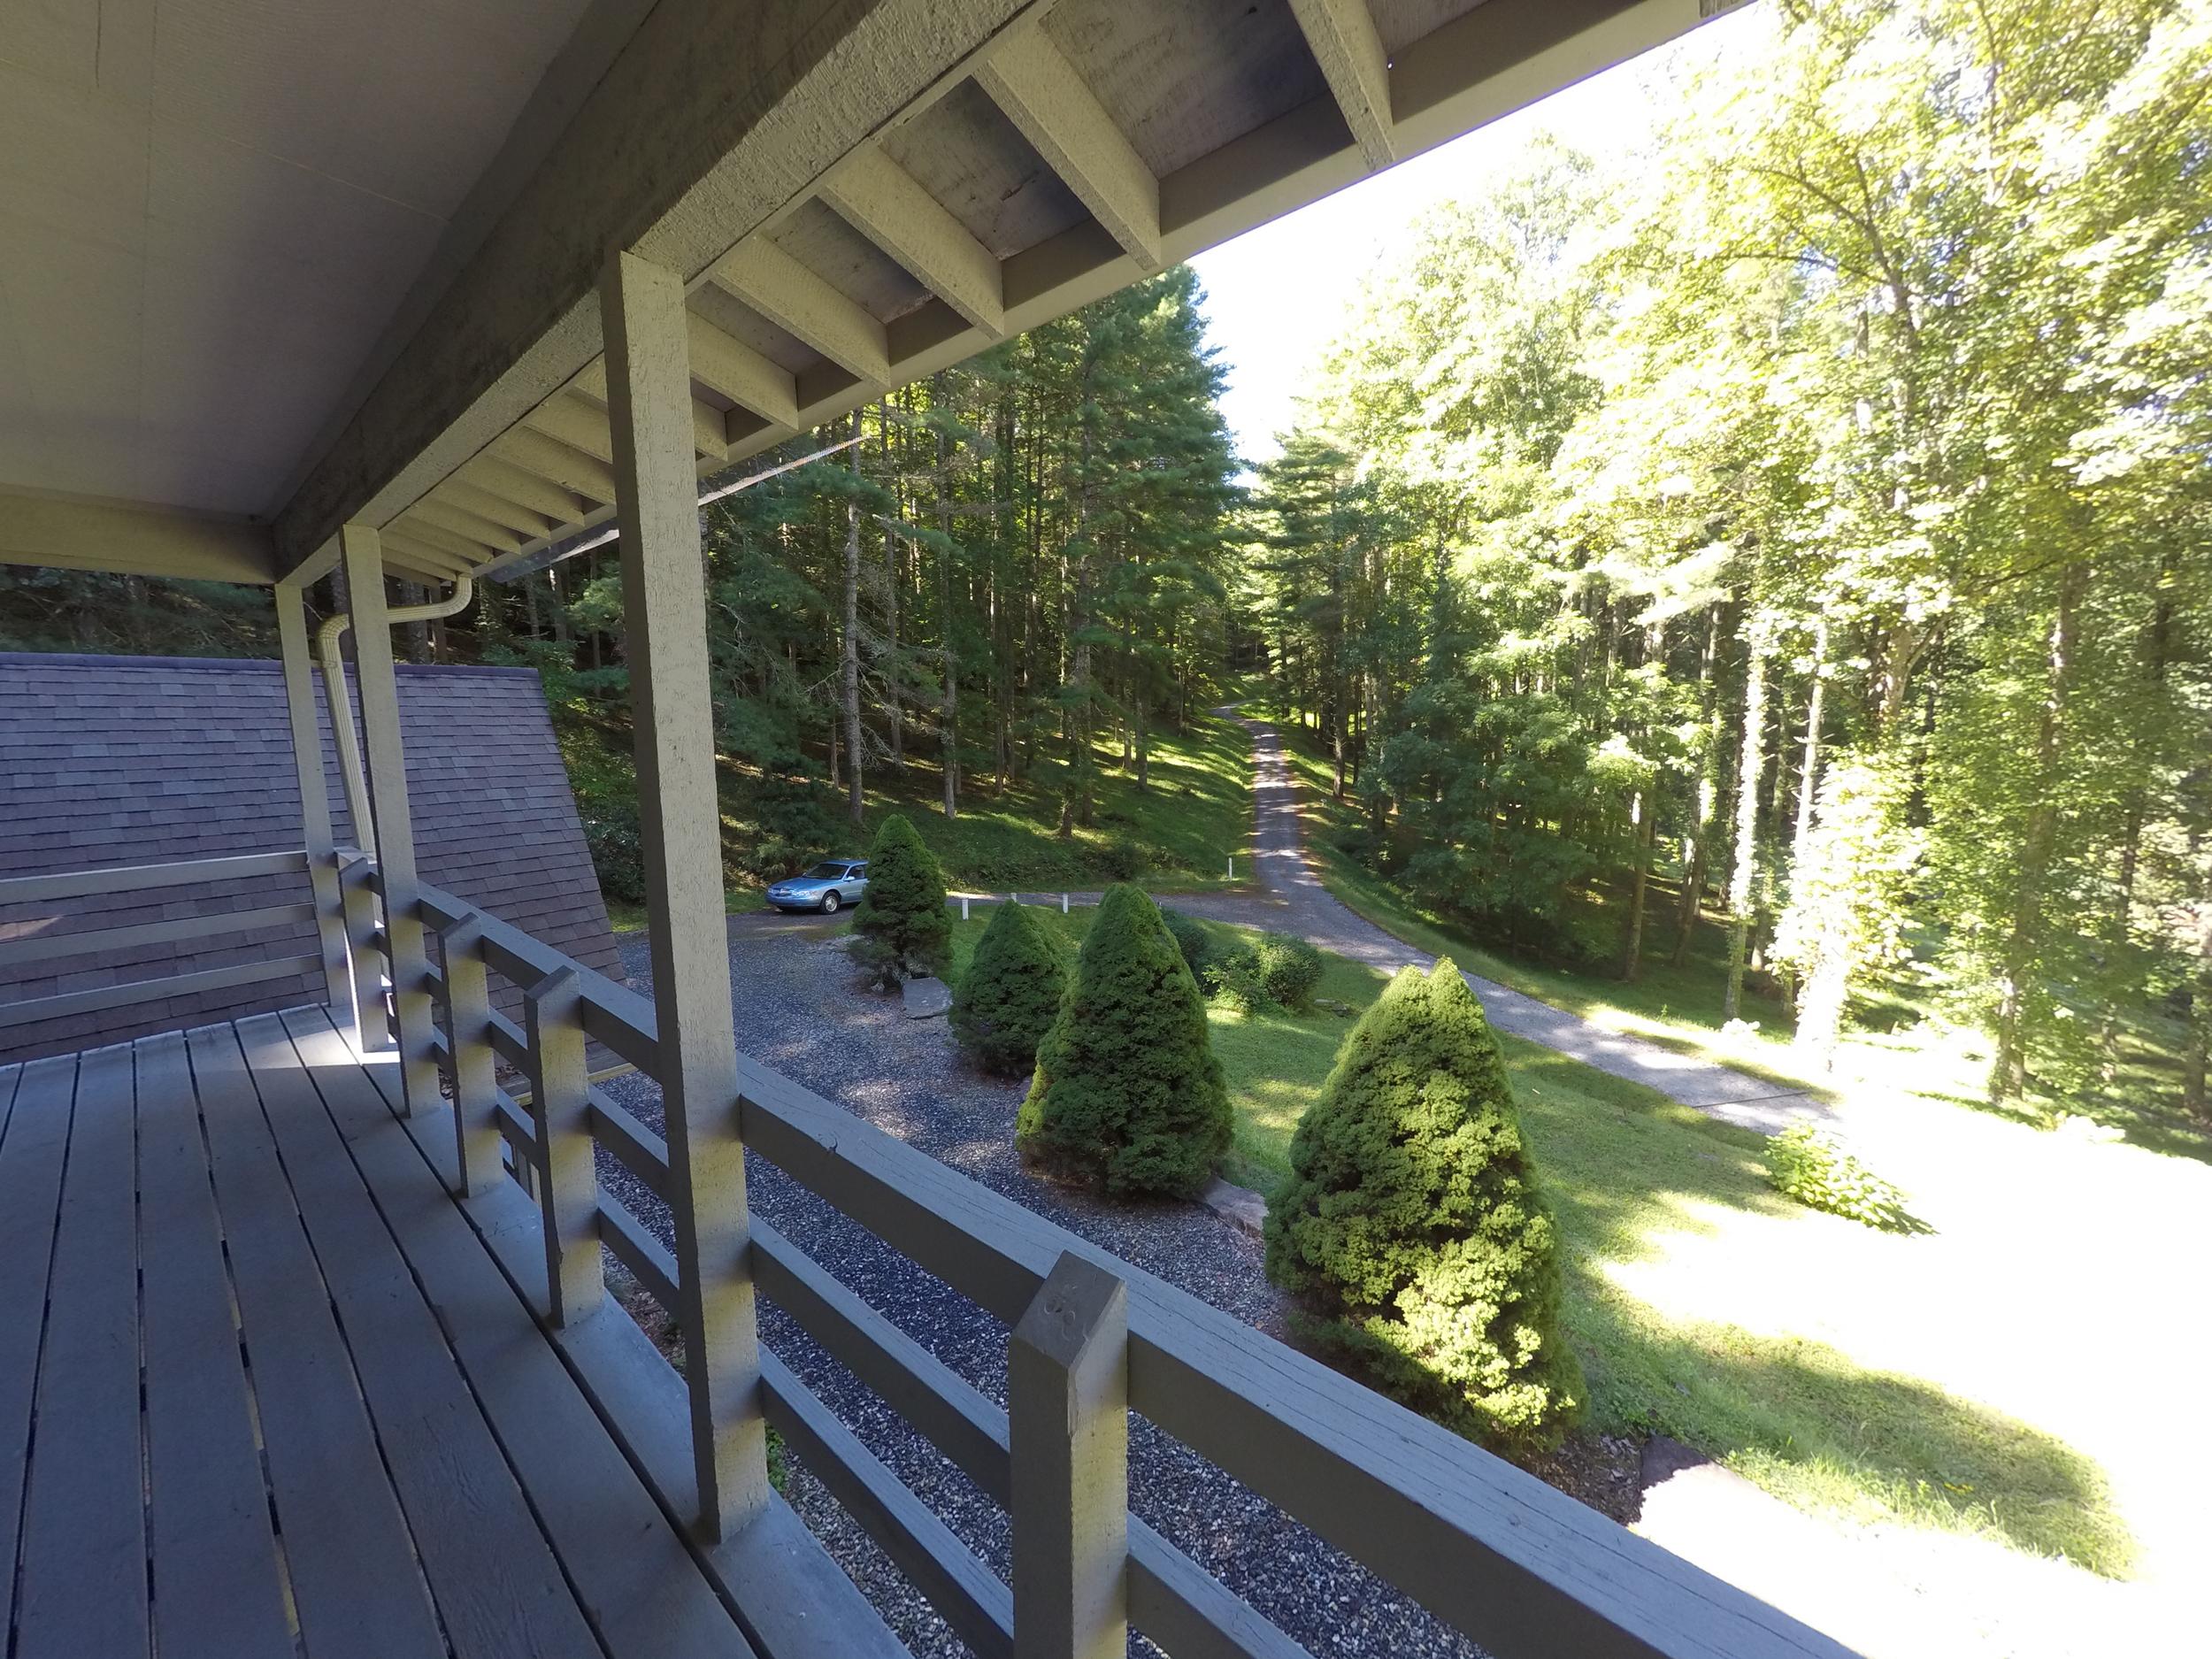 Settlers-Mountain-Rental-Cabins-121.jpg